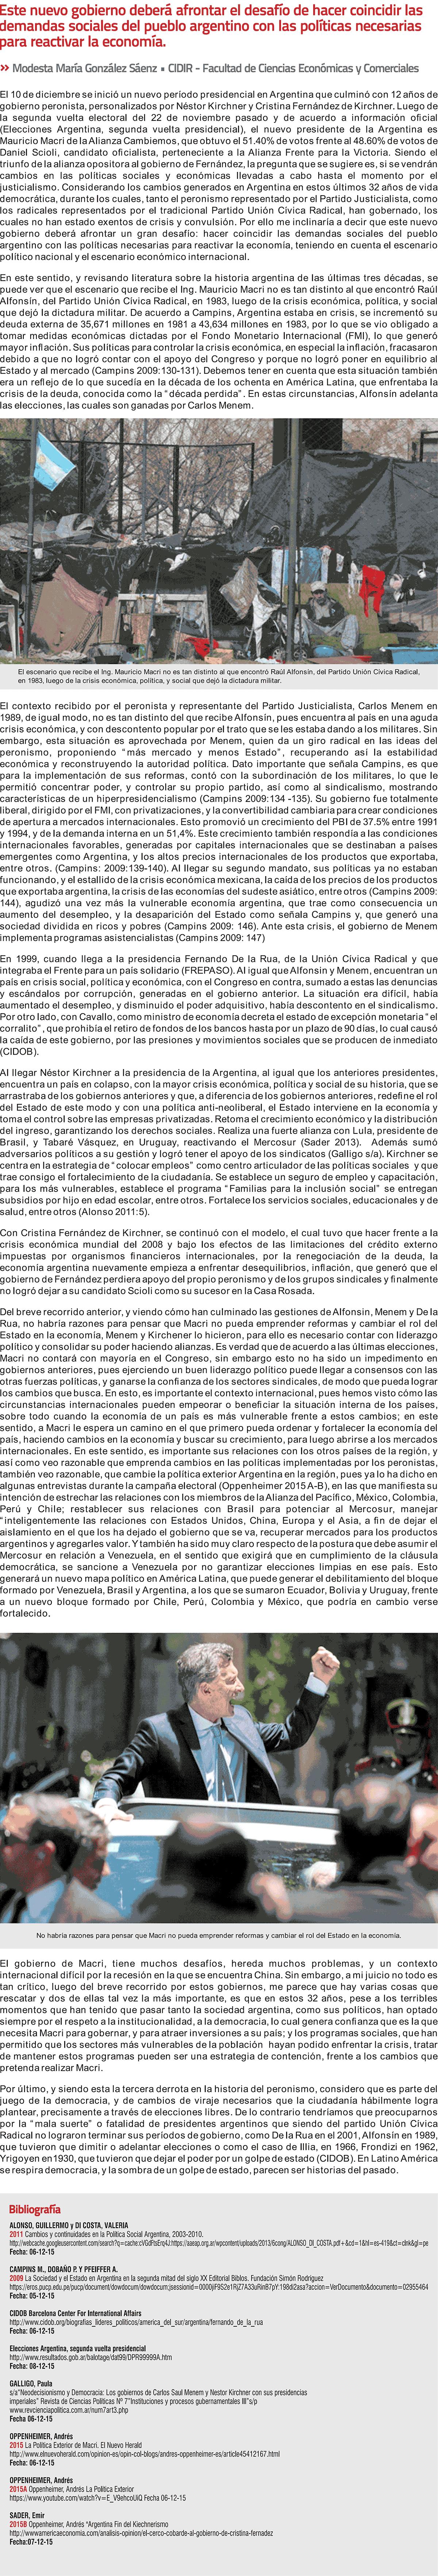 Desafio-Macri---text